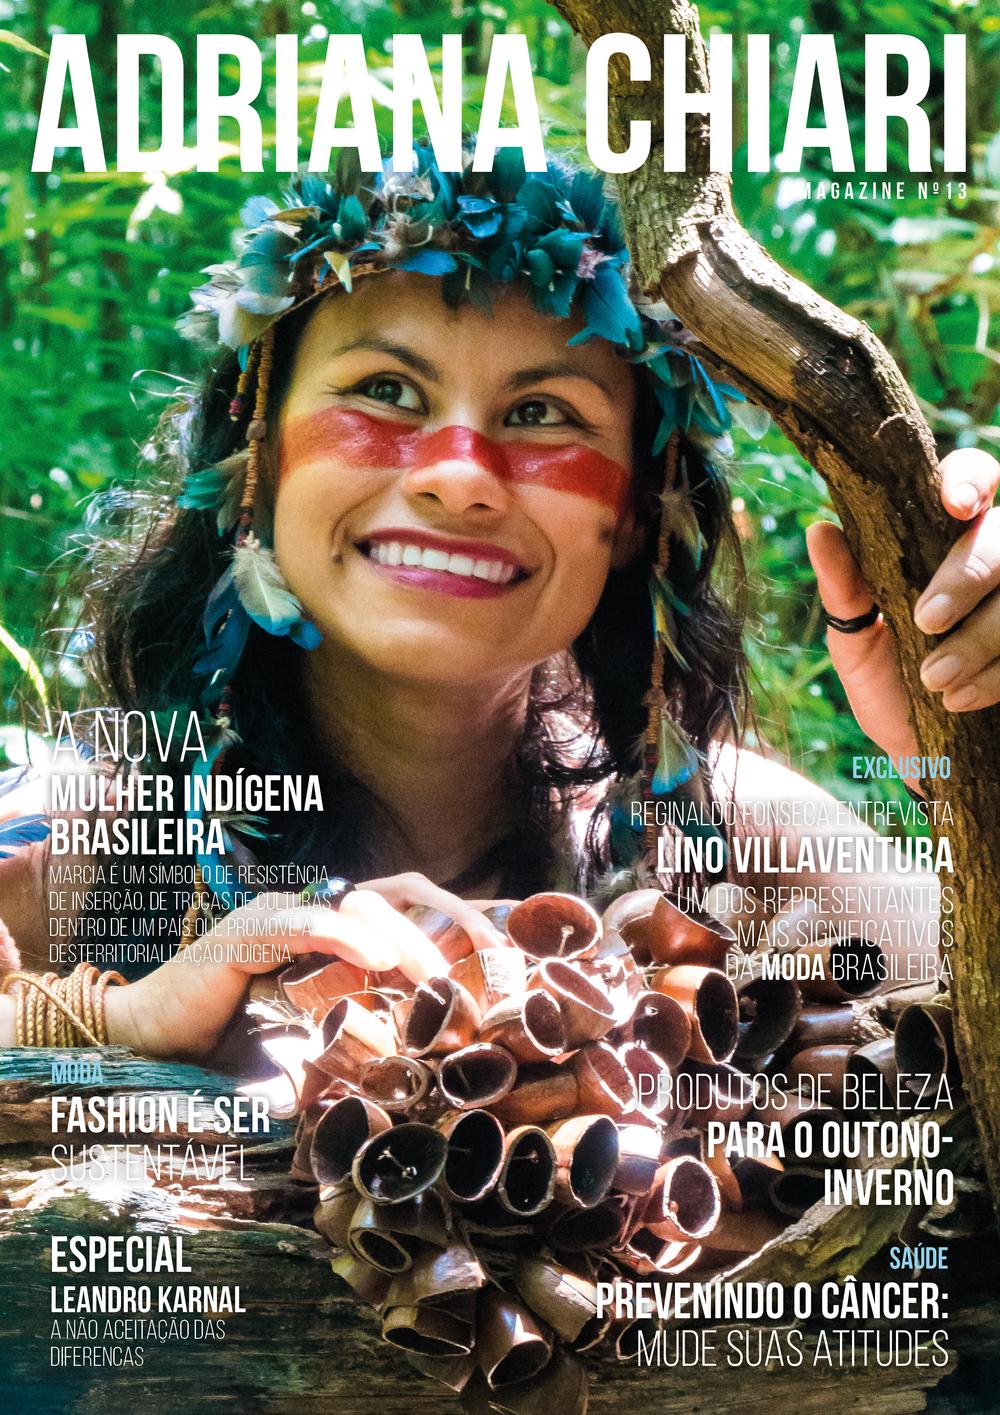 13ª Edição Adriana Chiari Magazine - Setembro - 2018